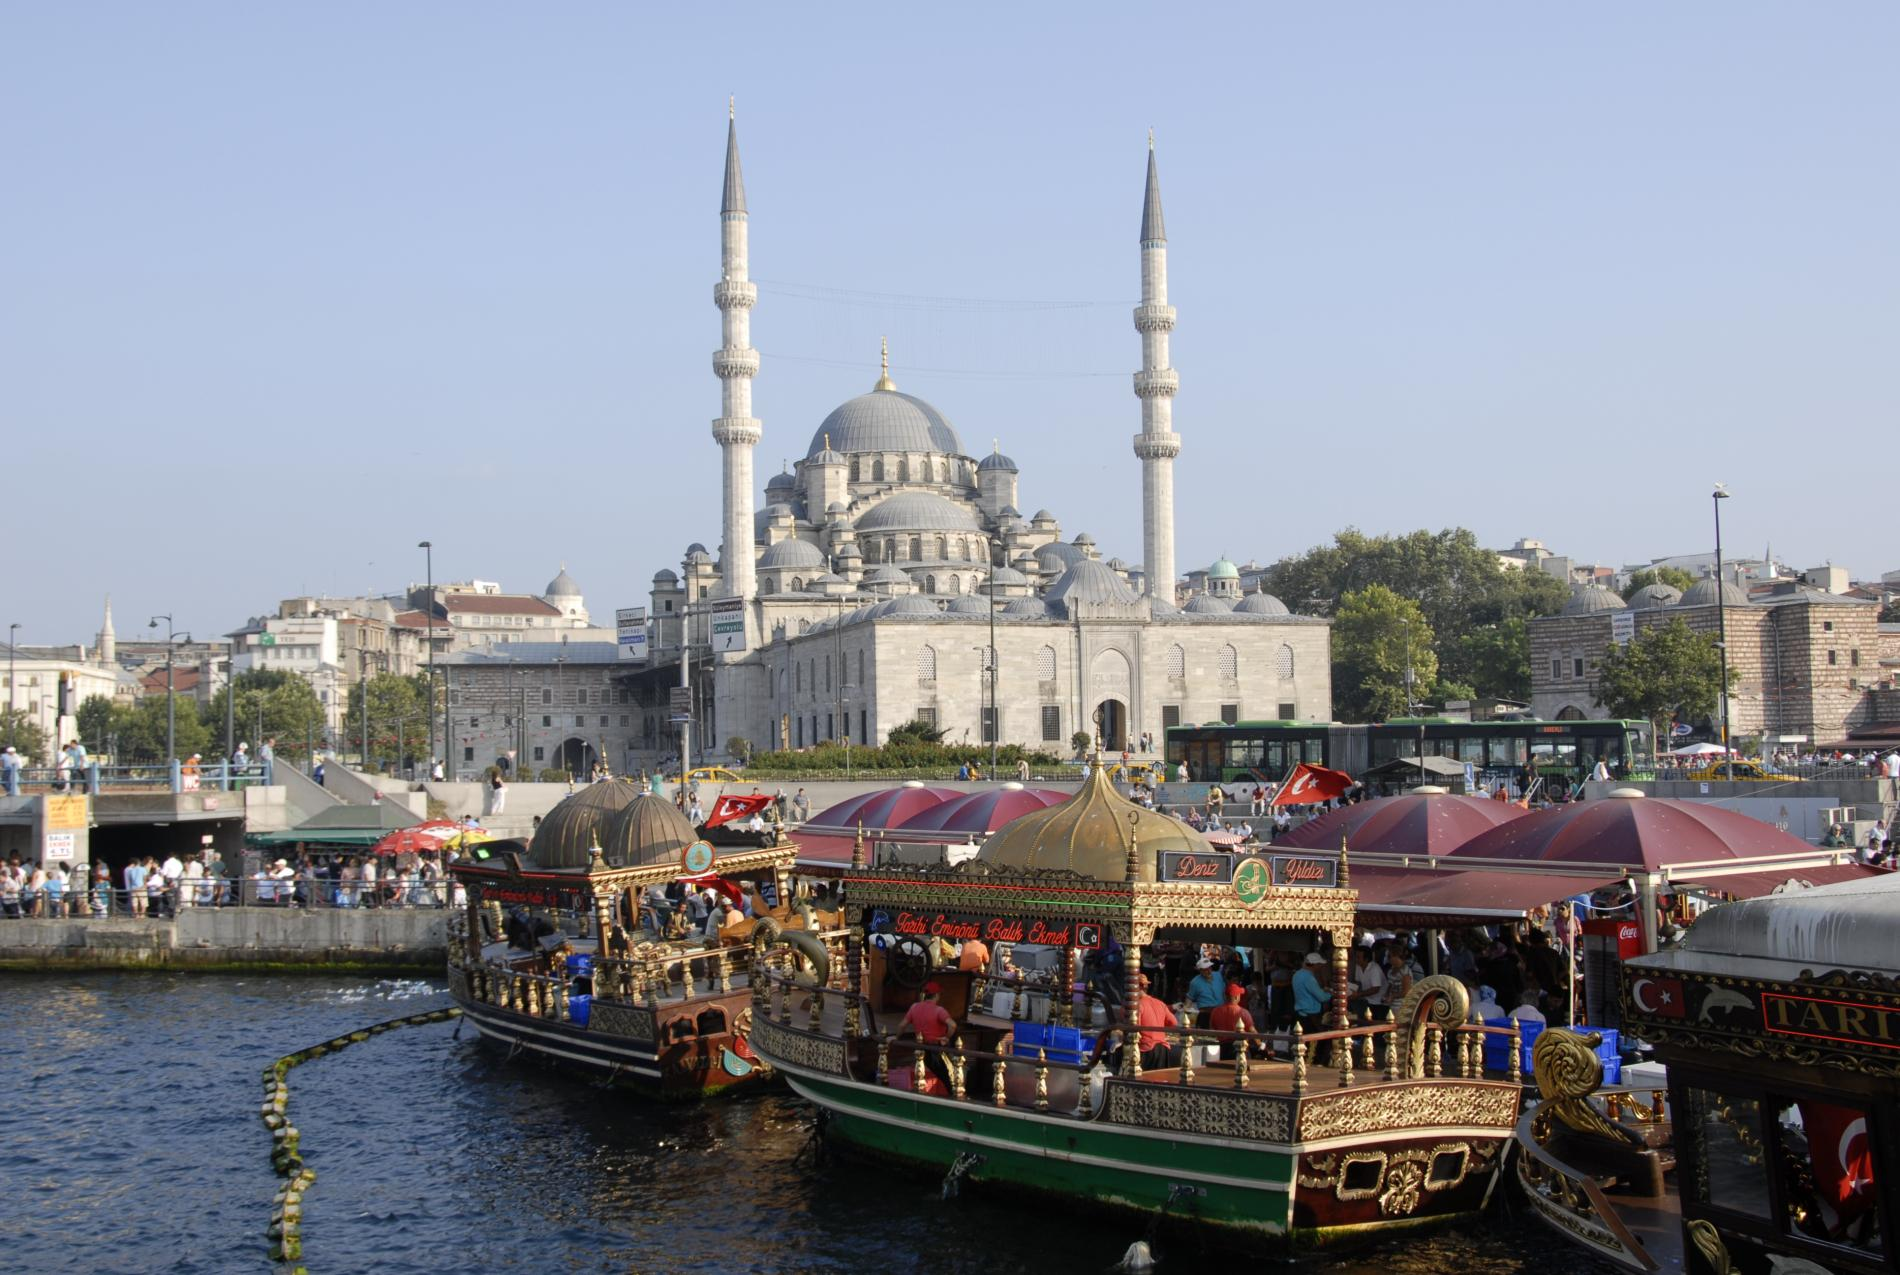 Voyage solidaire Turquie : Vision du Monde - Photo 11